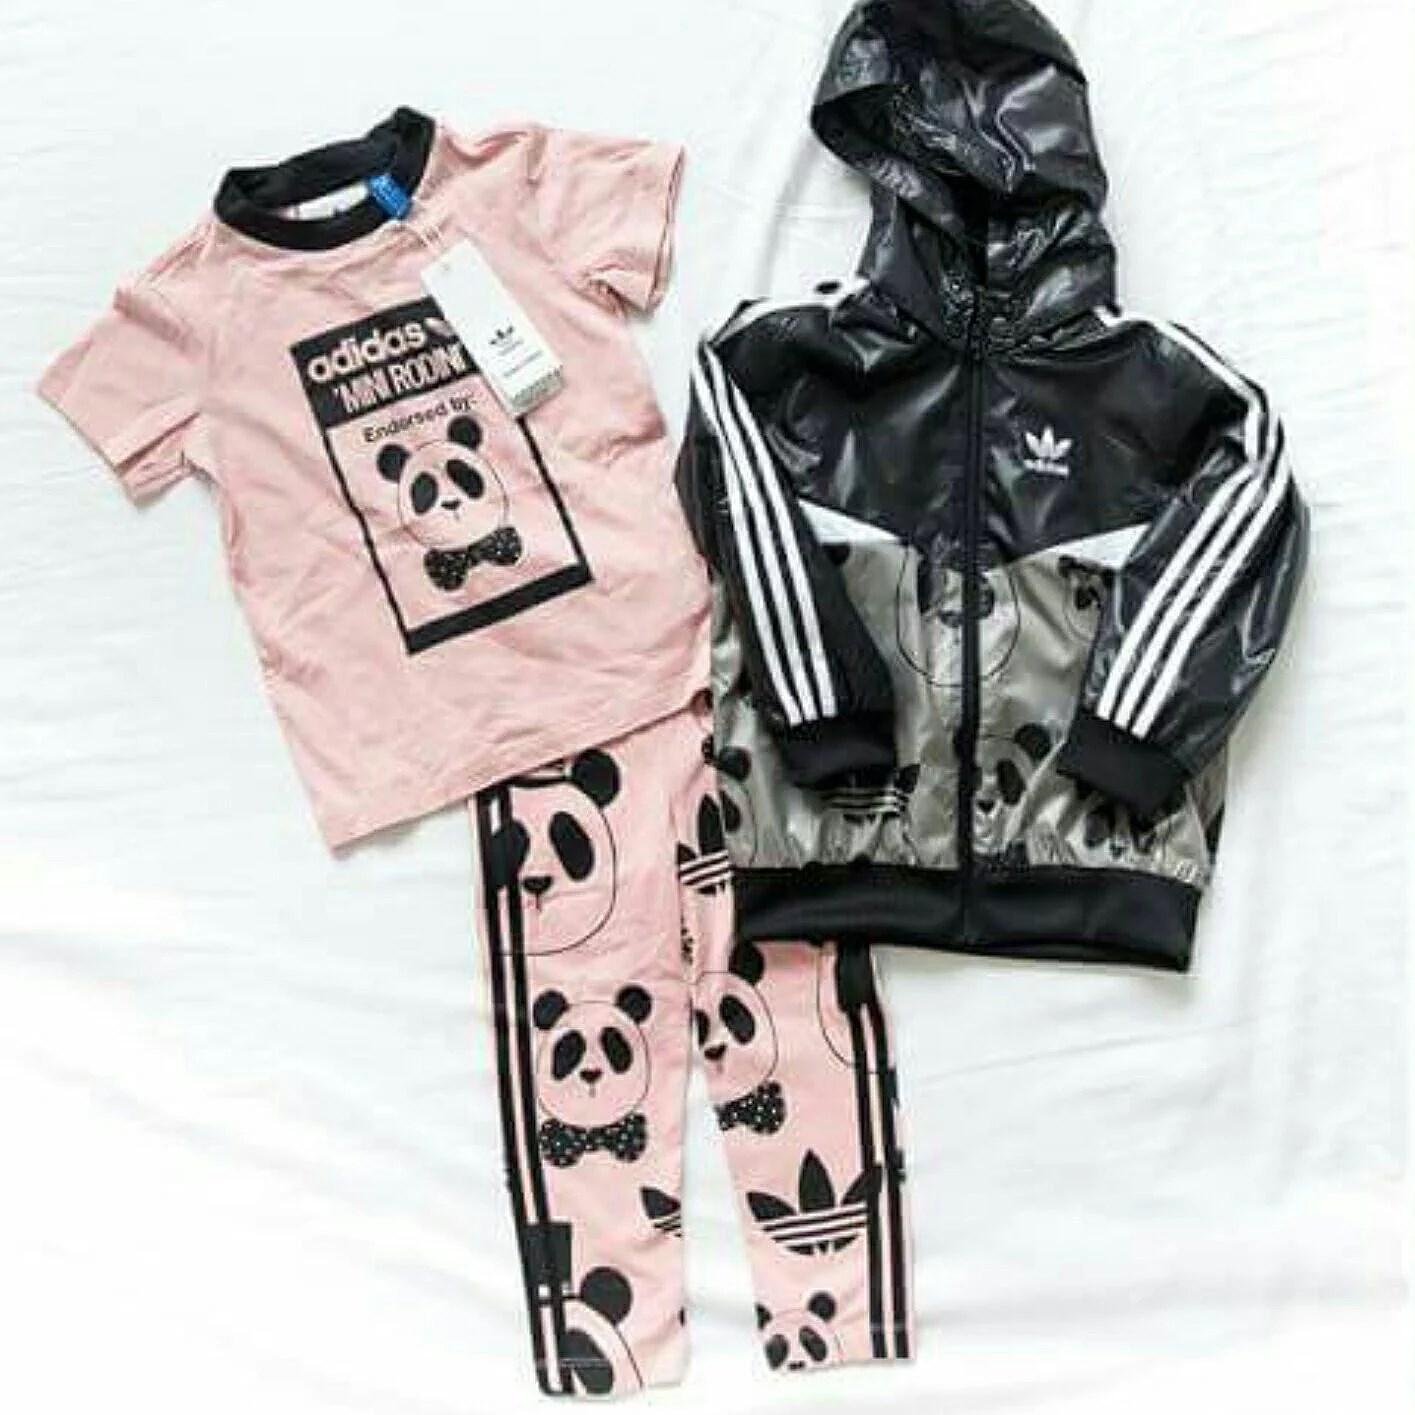 Mini rodini + Adidas = True